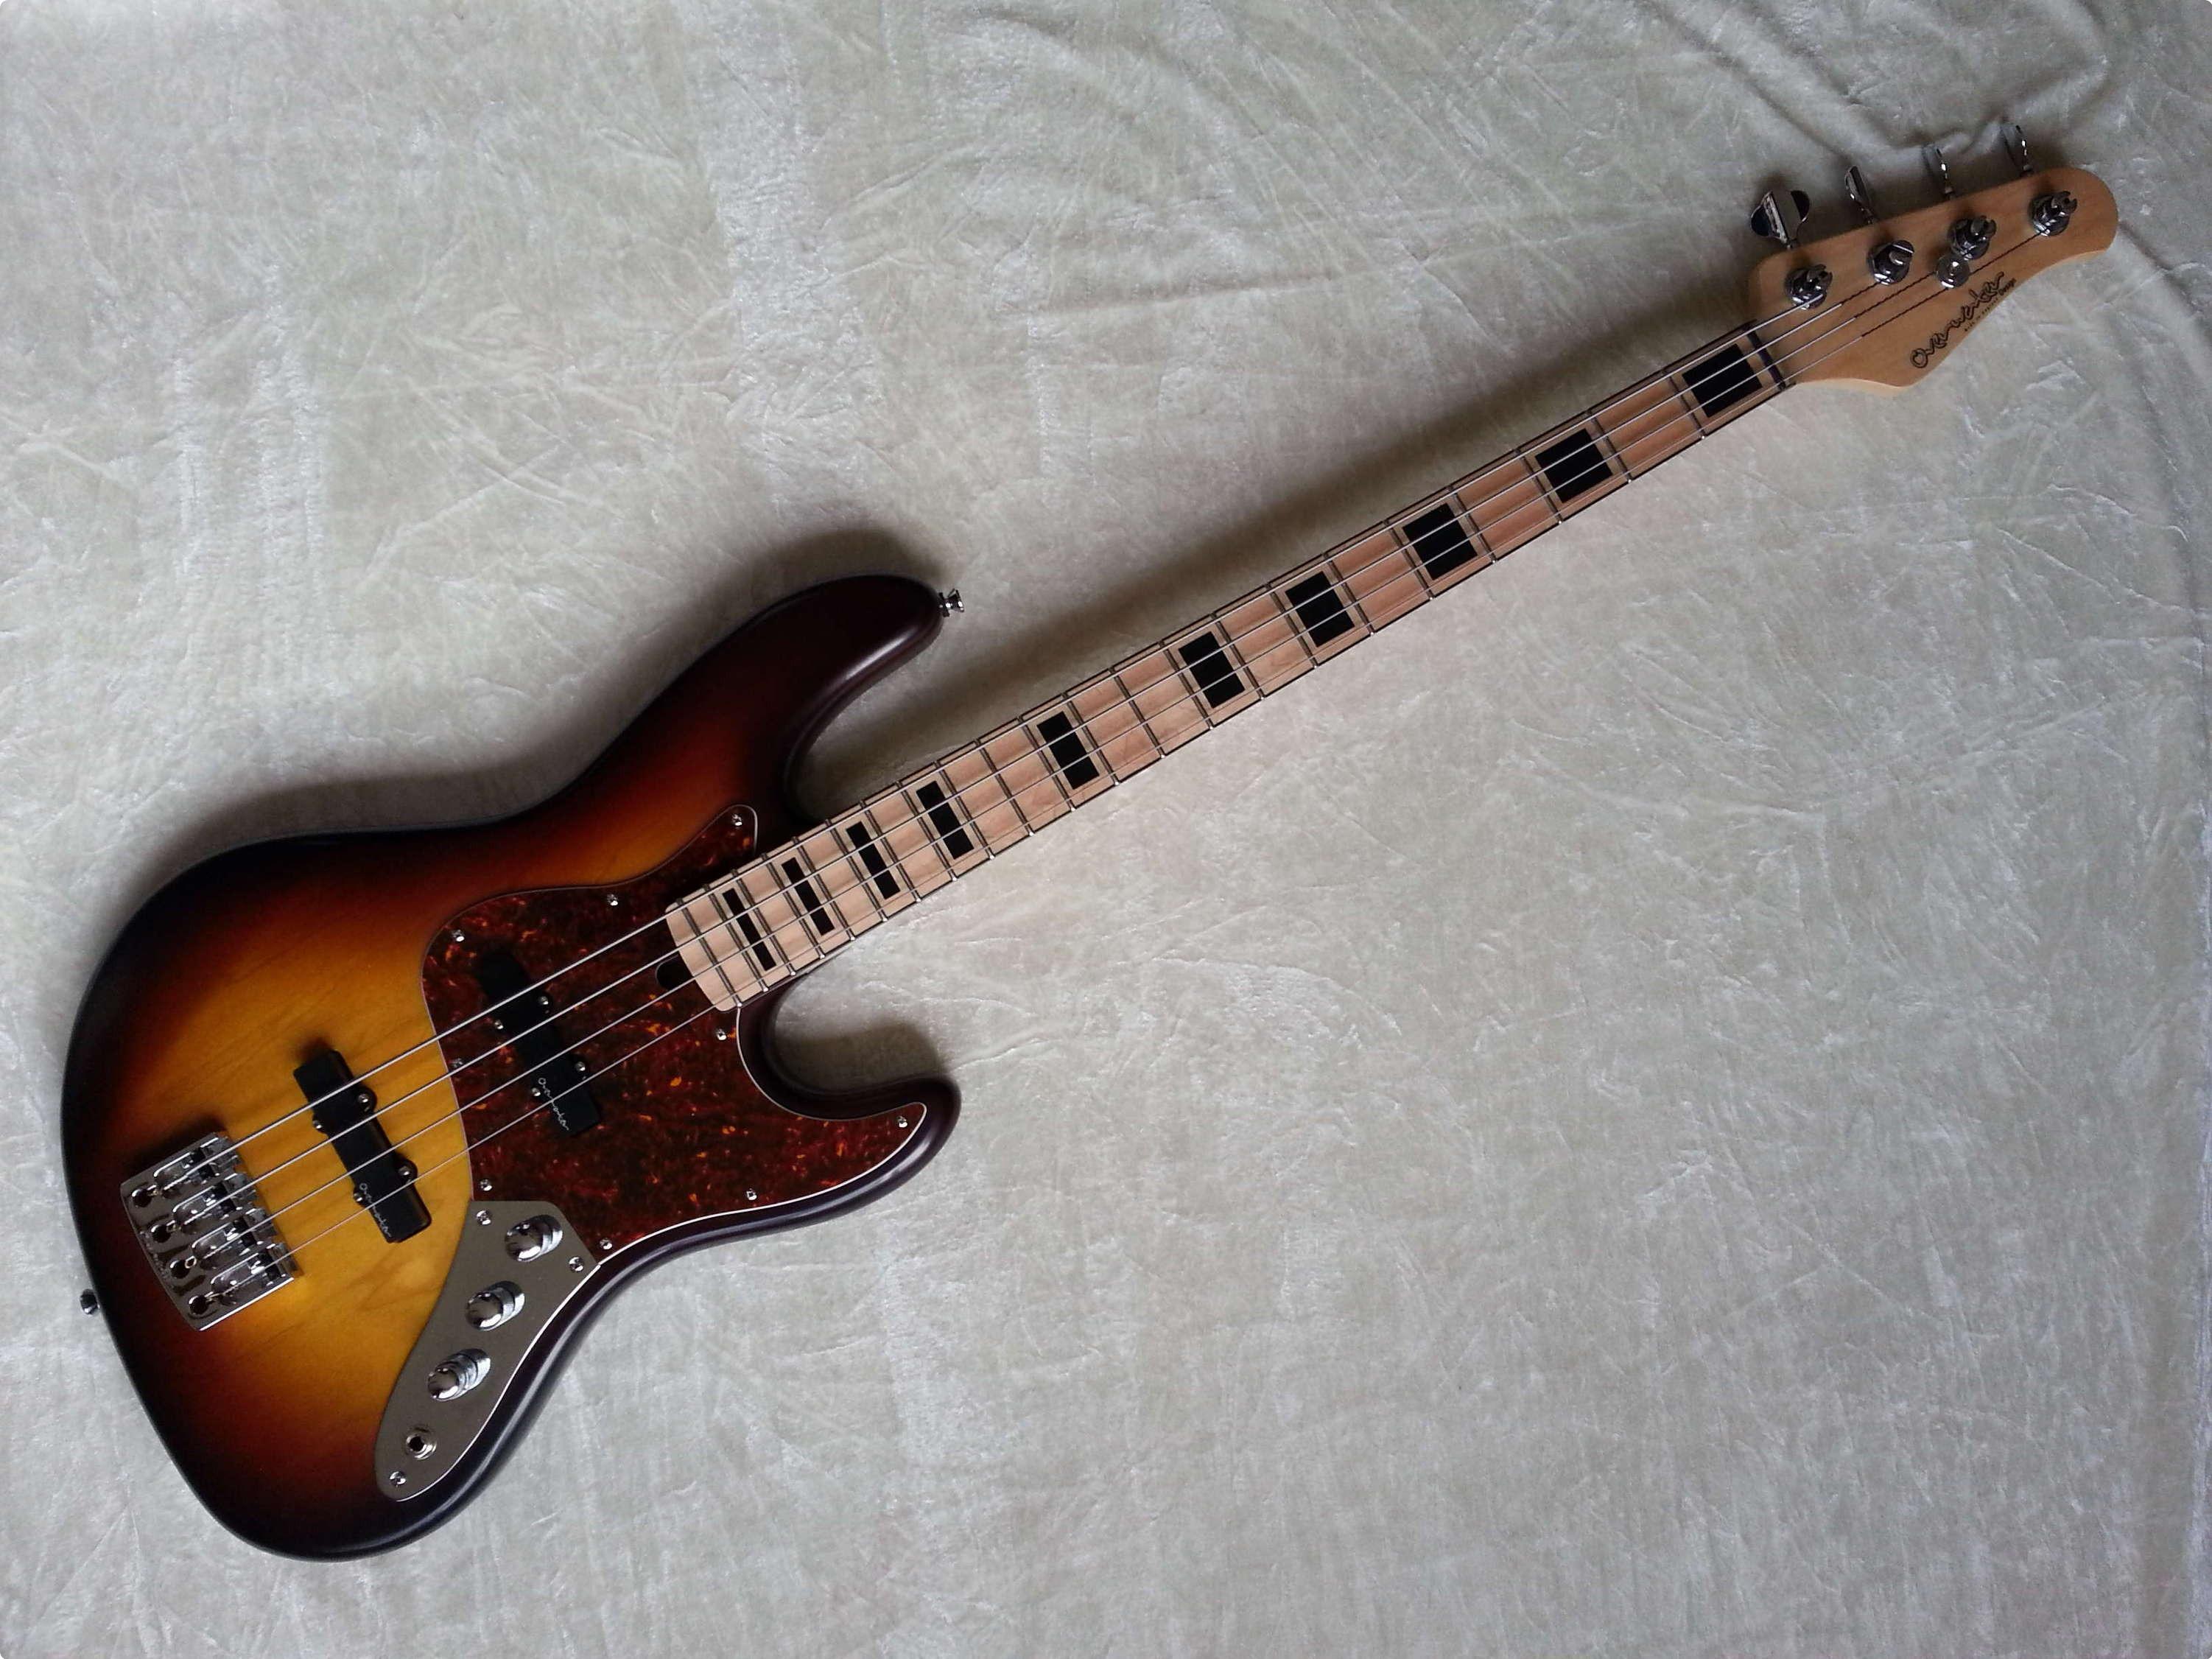 overwater standard jazz bass active passive 2014 sunburst bass for sale cotswold bass guitars. Black Bedroom Furniture Sets. Home Design Ideas